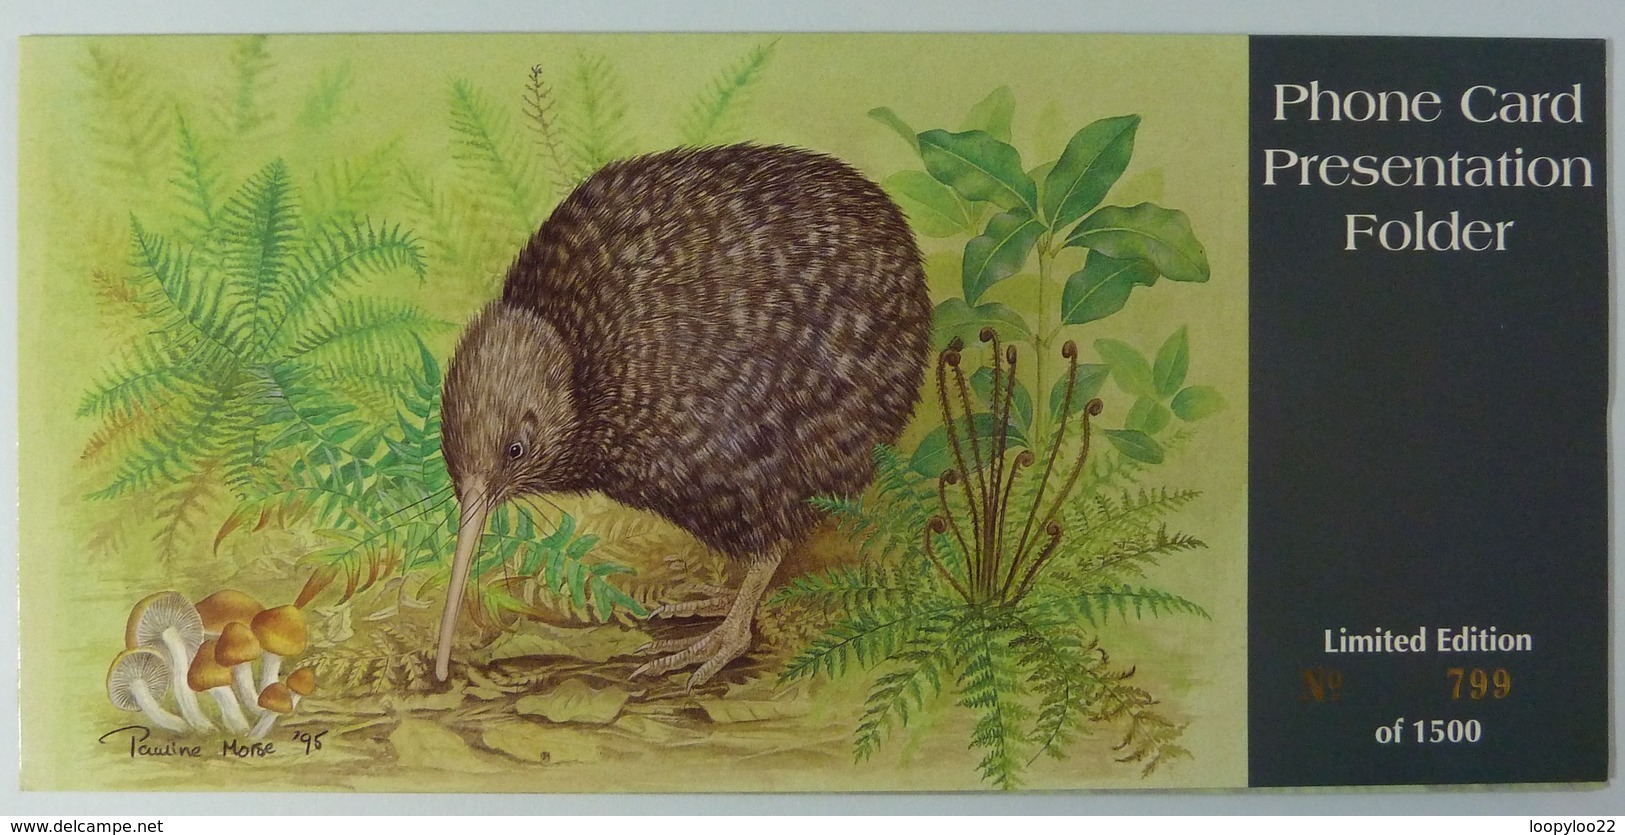 New Zealand - GPT - Little Spotted Kiwi - Airways Florist - $10 - 1500ex - Mint In Folder - New Zealand